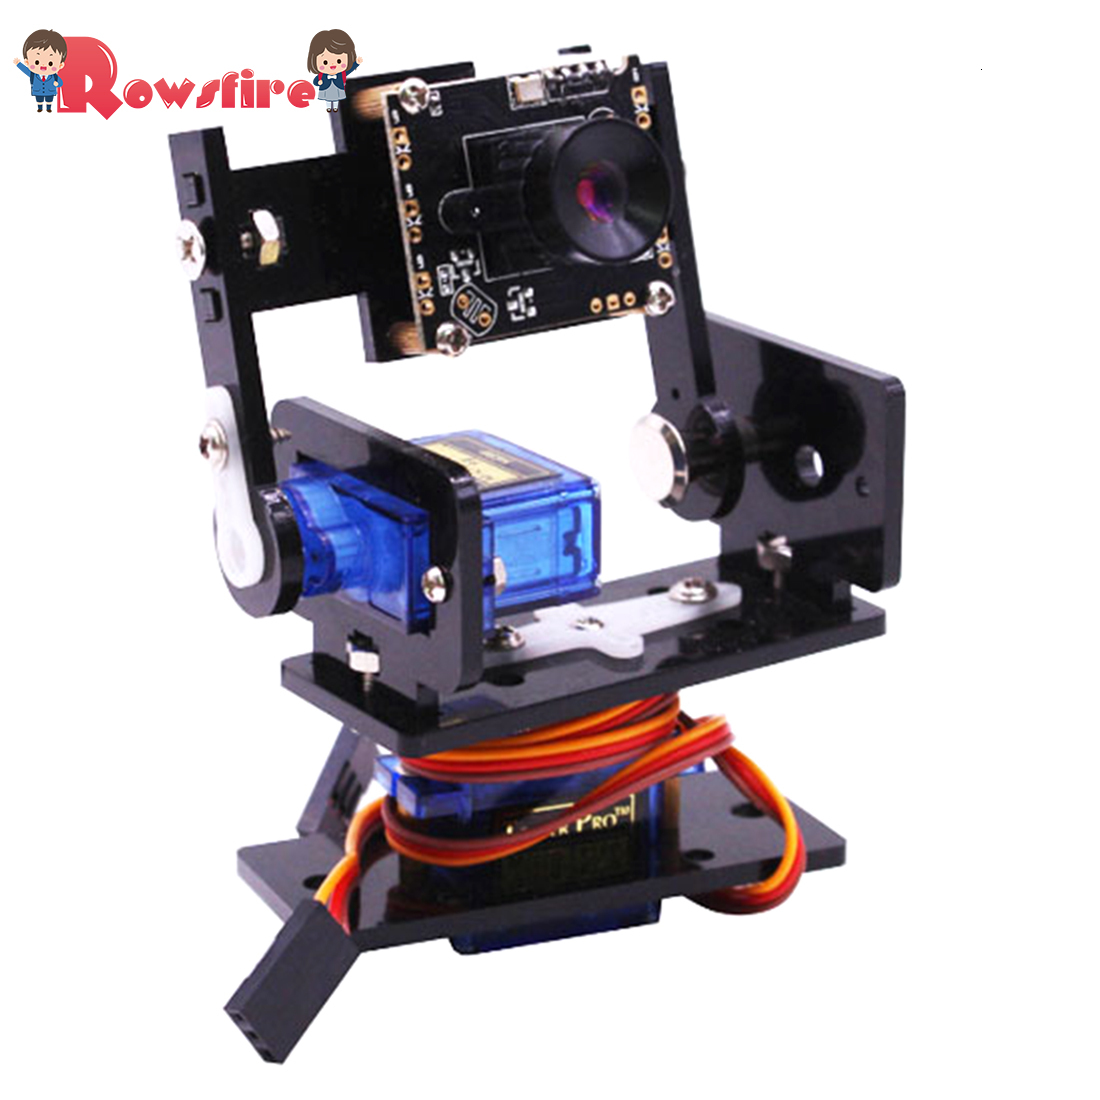 Camera Module Smart Vision Sensor Pan-Tilt Kit with 2 Pcs Micro Servos Smart Robot HD Camera for Raspberry Pi-Camera Single PTZ